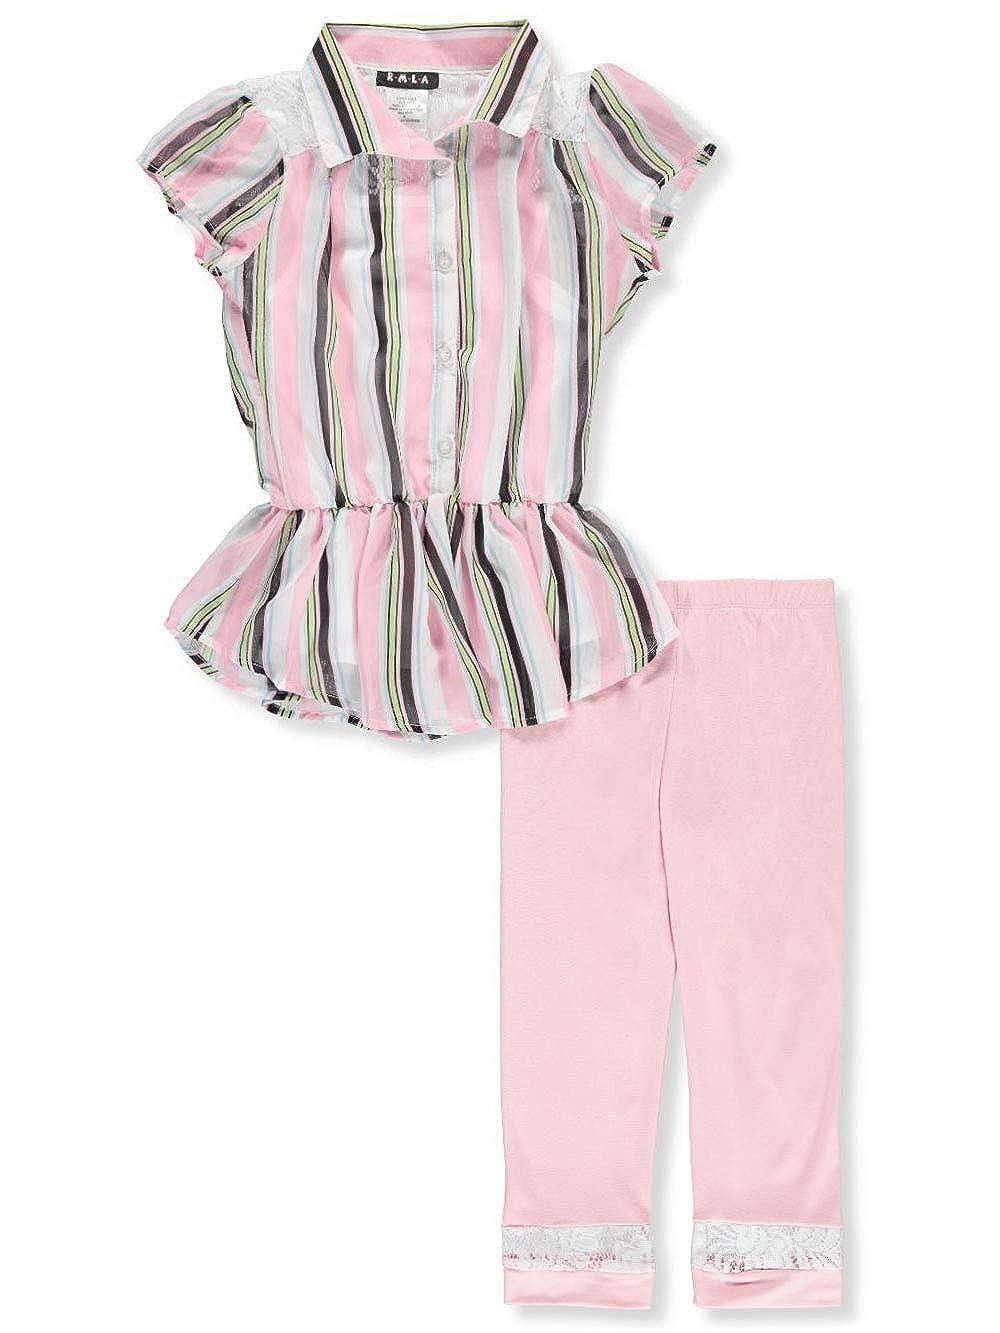 RMLA Girls 3-Piece Leggings Set Outfit